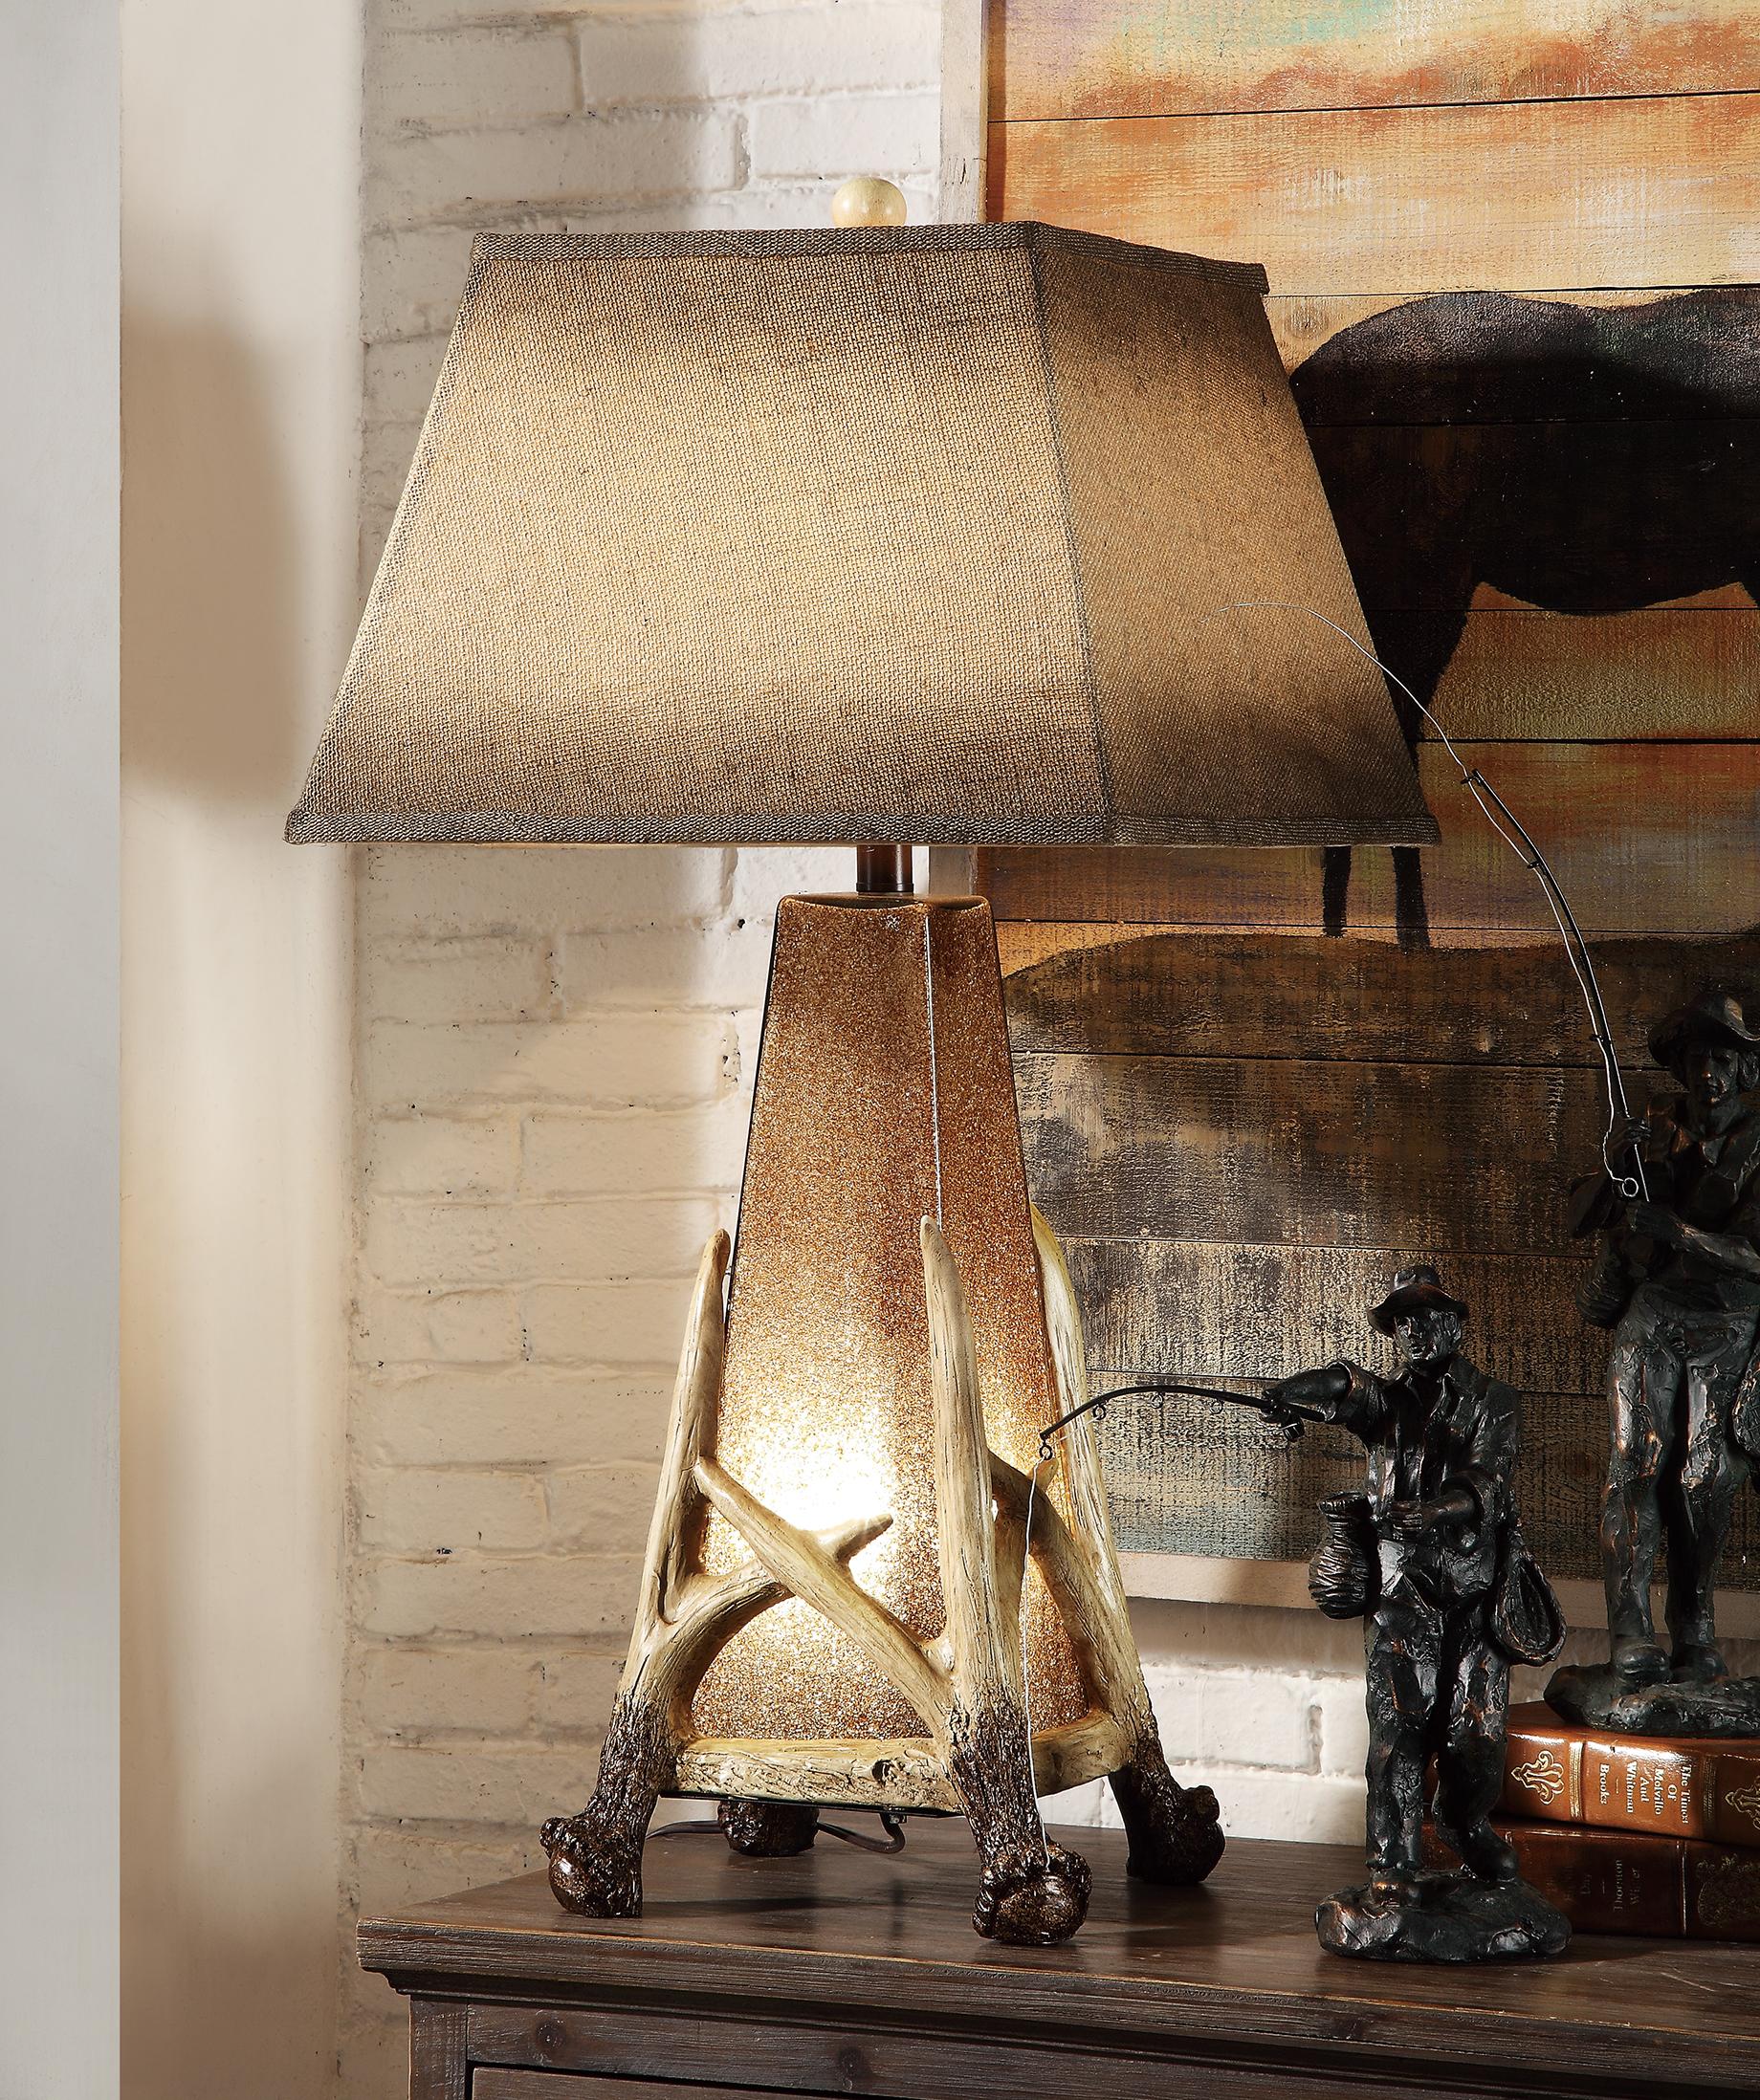 NEW Pair of Antler Nightlight Lamps